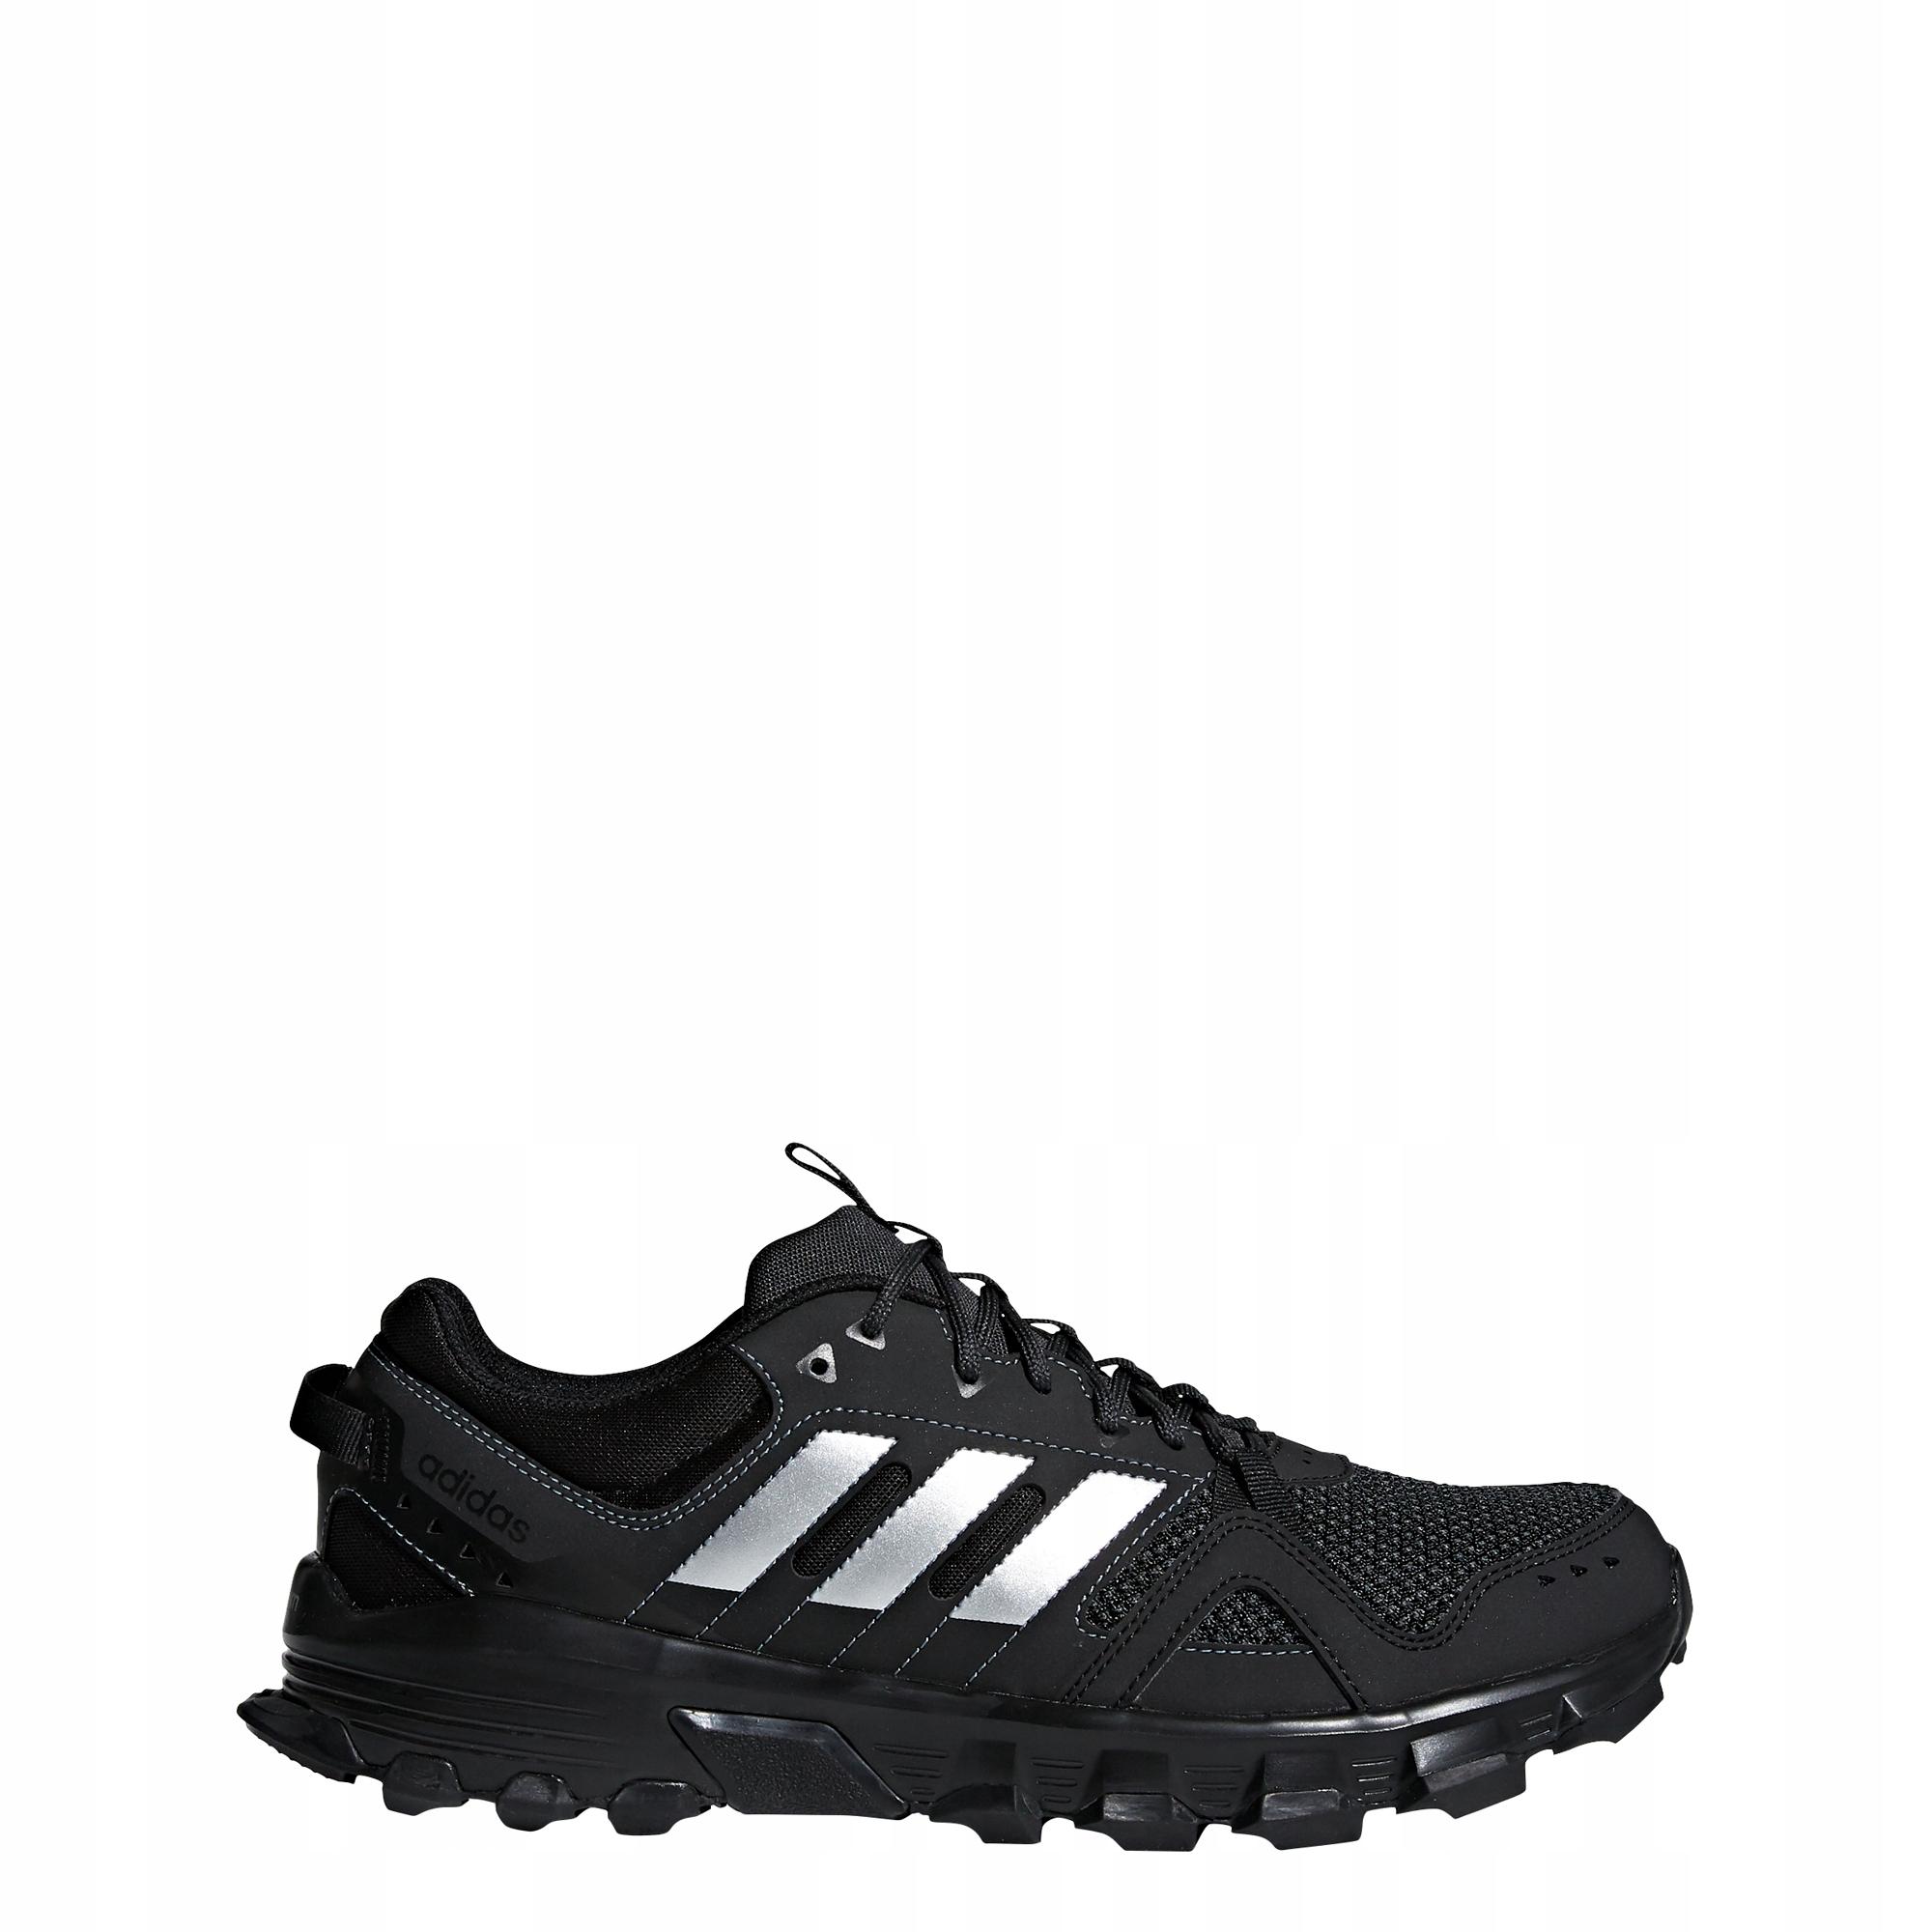 65b9481e8 buty męskie adidas rockadia trail r 46 CG3982 - 7558505918 ...